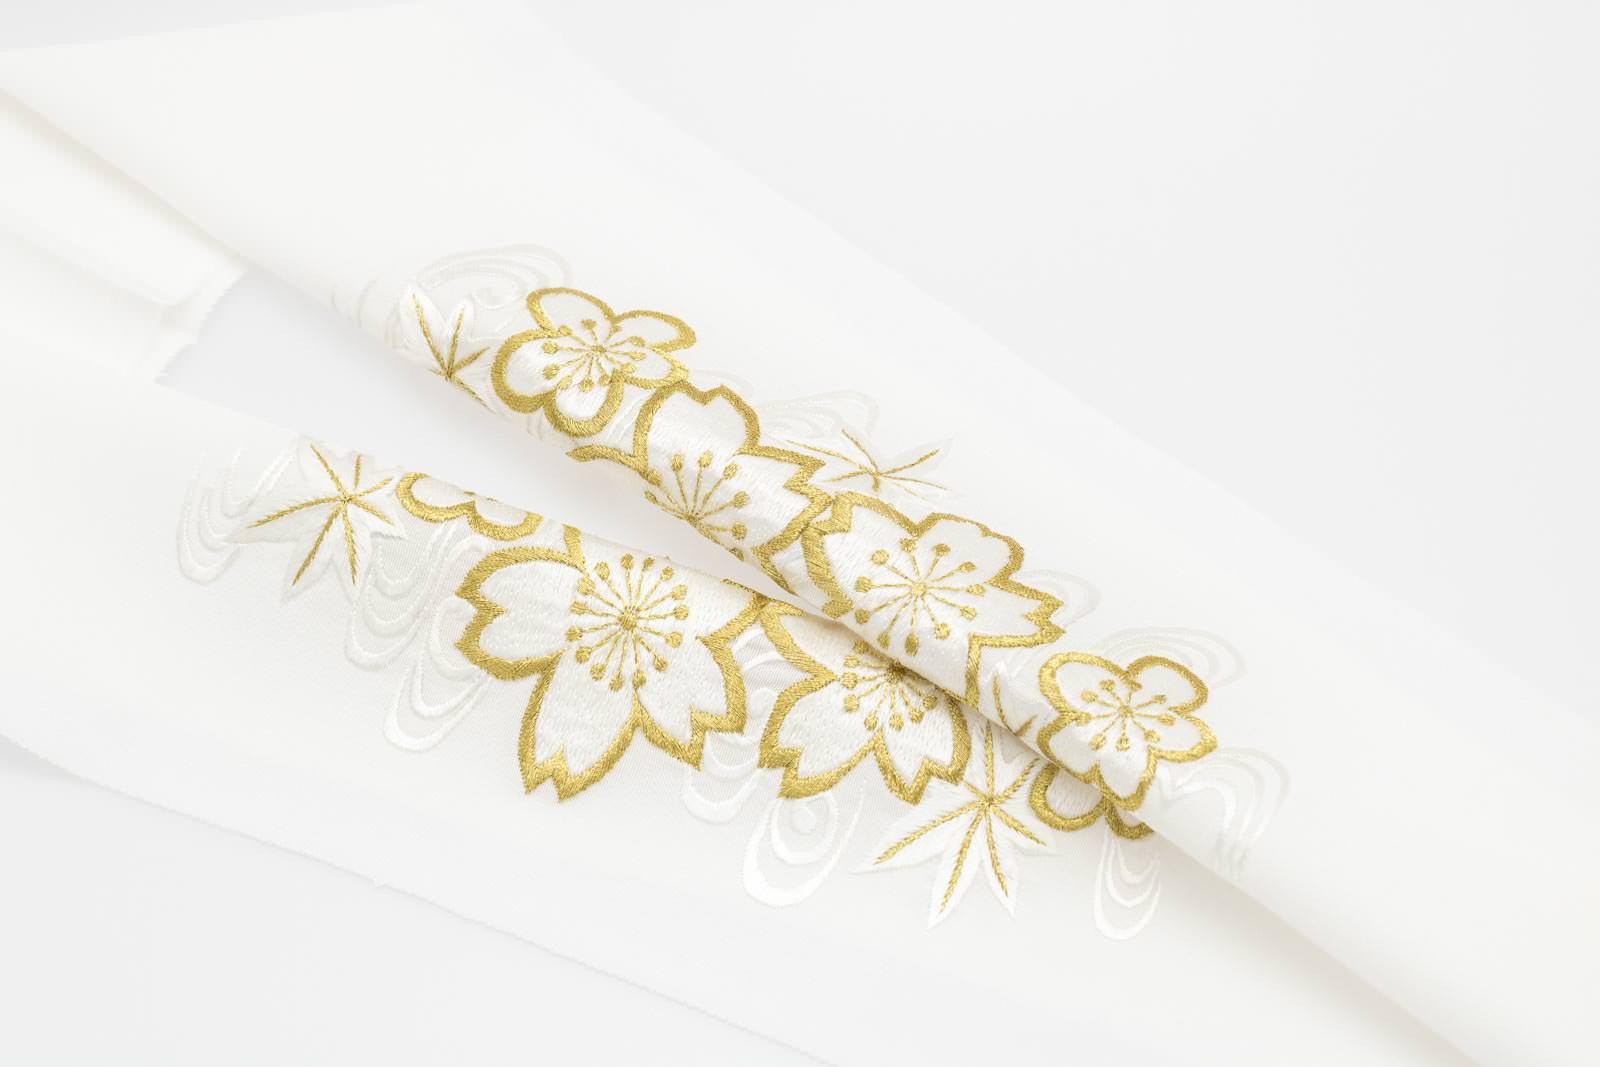 手刺繍 半襟 パールトーン加工済 シルク100% 塩瀬 手刺繍 半衿 白 四季折々(刺繍糸 白×金)